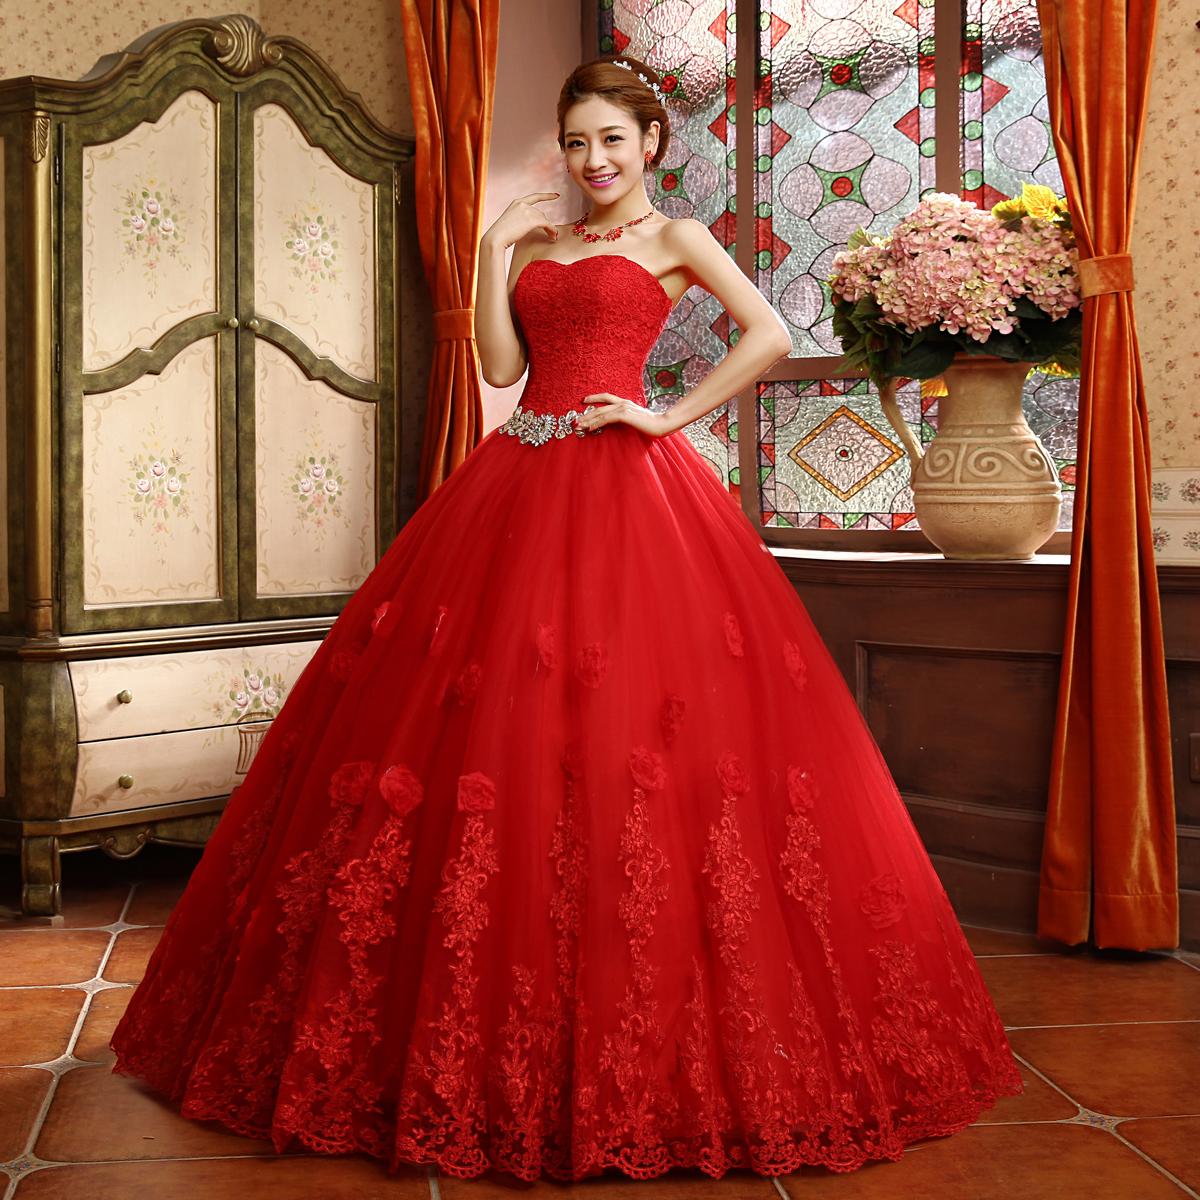 Red Wedding Dresses: Robes étonnantes Blog: Robe De Mariee Rouge Pas Chere